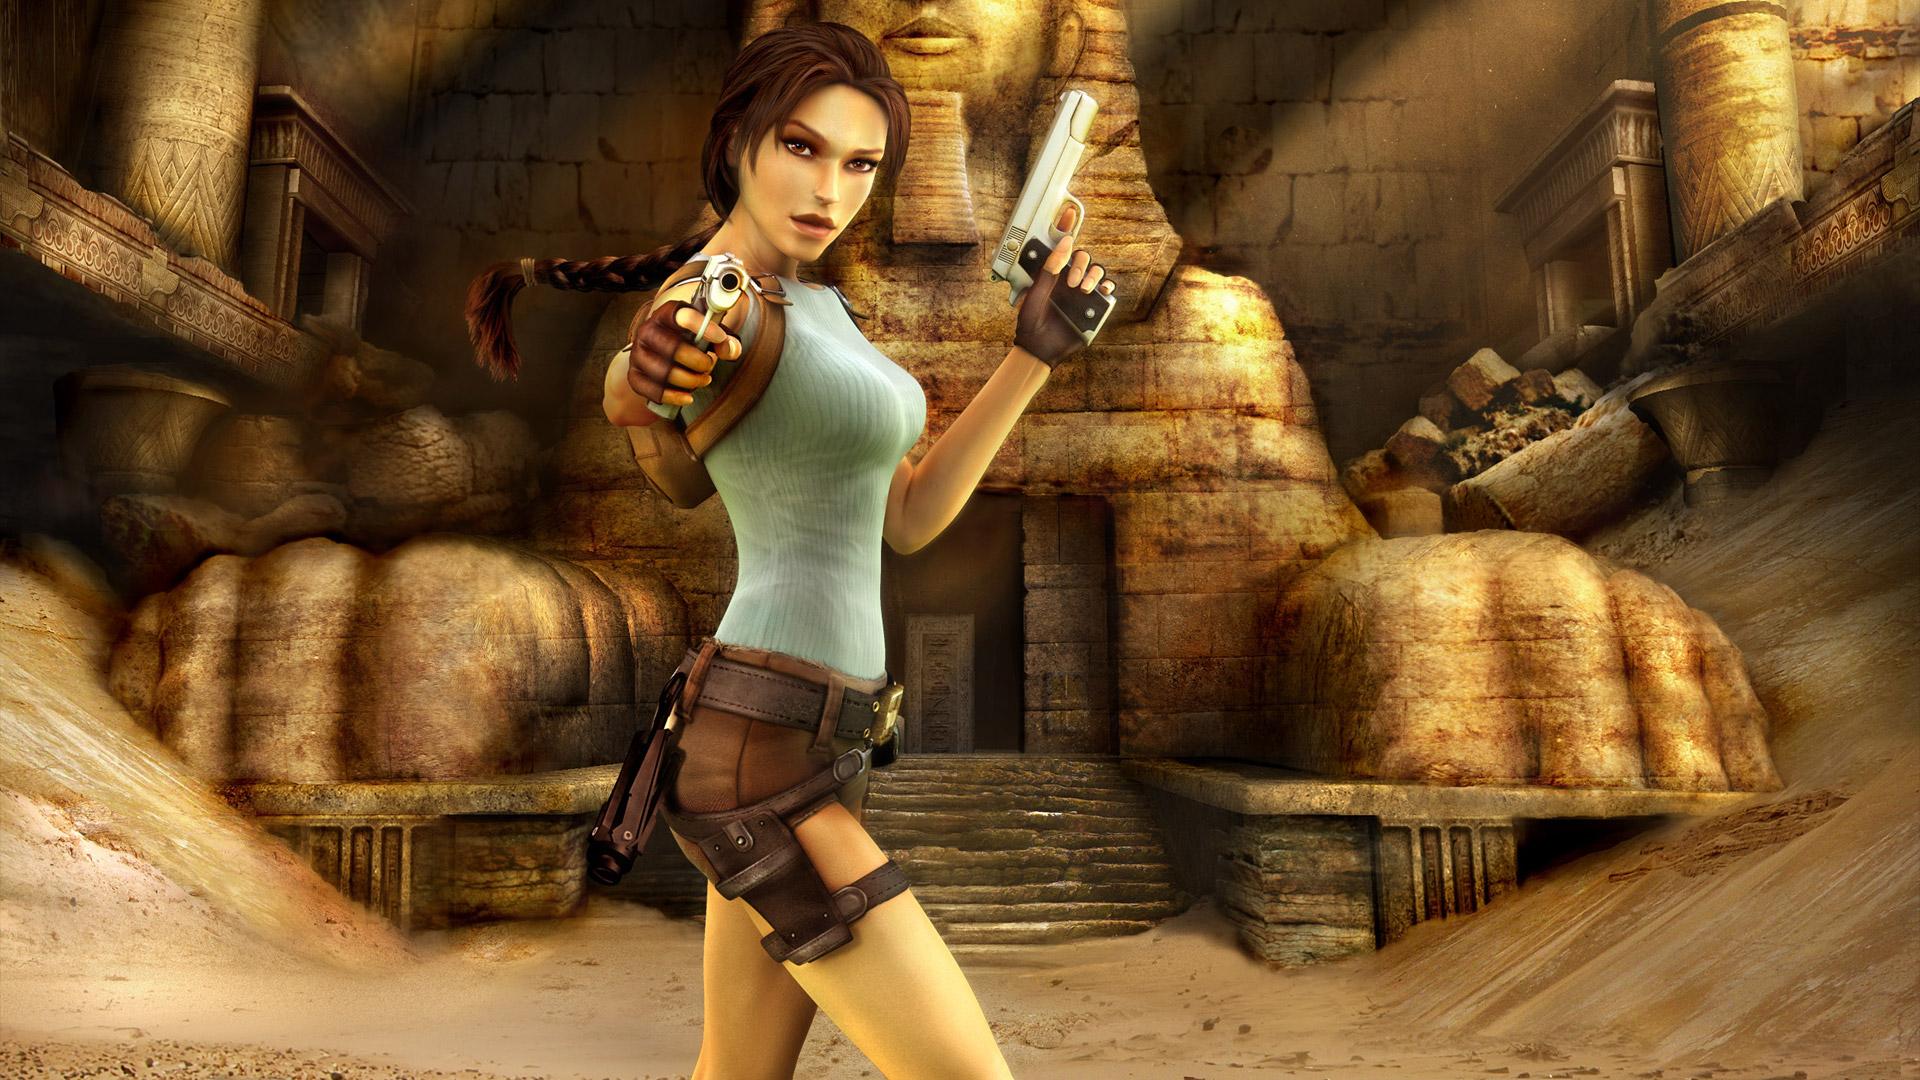 Free Tomb Raider: Anniversary Wallpaper in 1920x1080